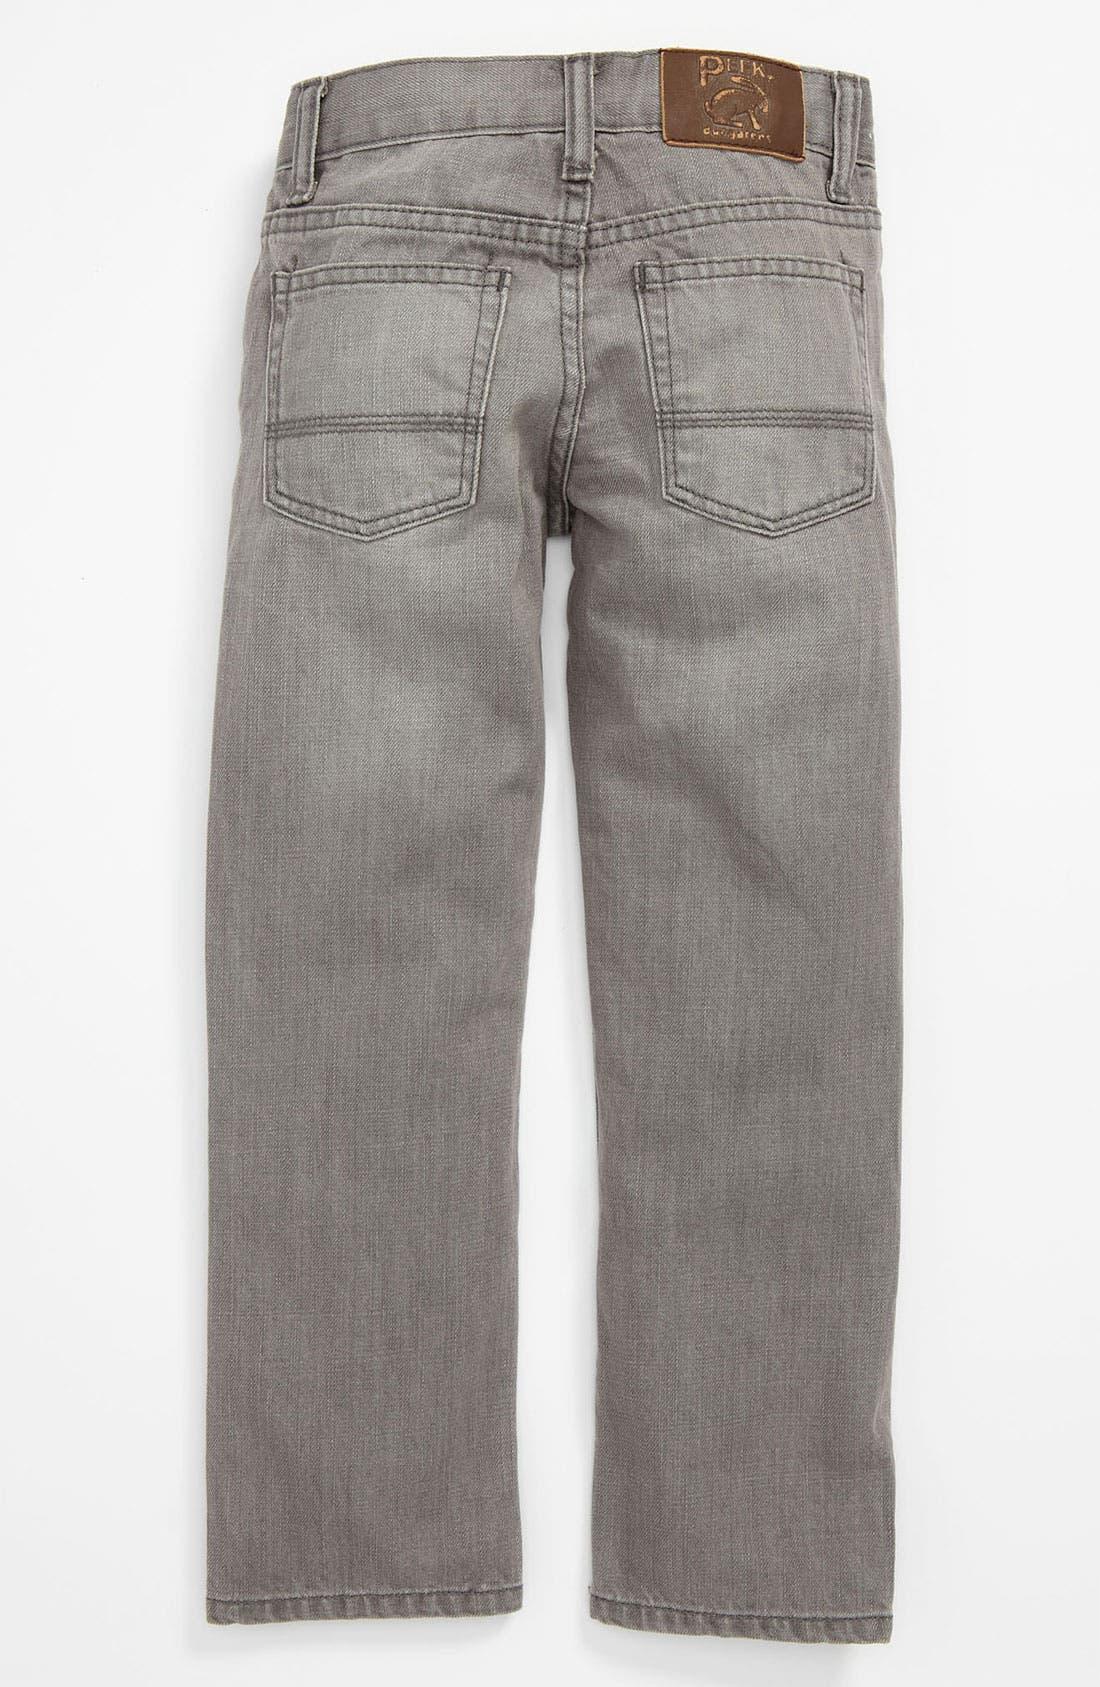 Main Image - Peek 'Ellis' Jeans (Toddler, Little Boys & Big Boys)